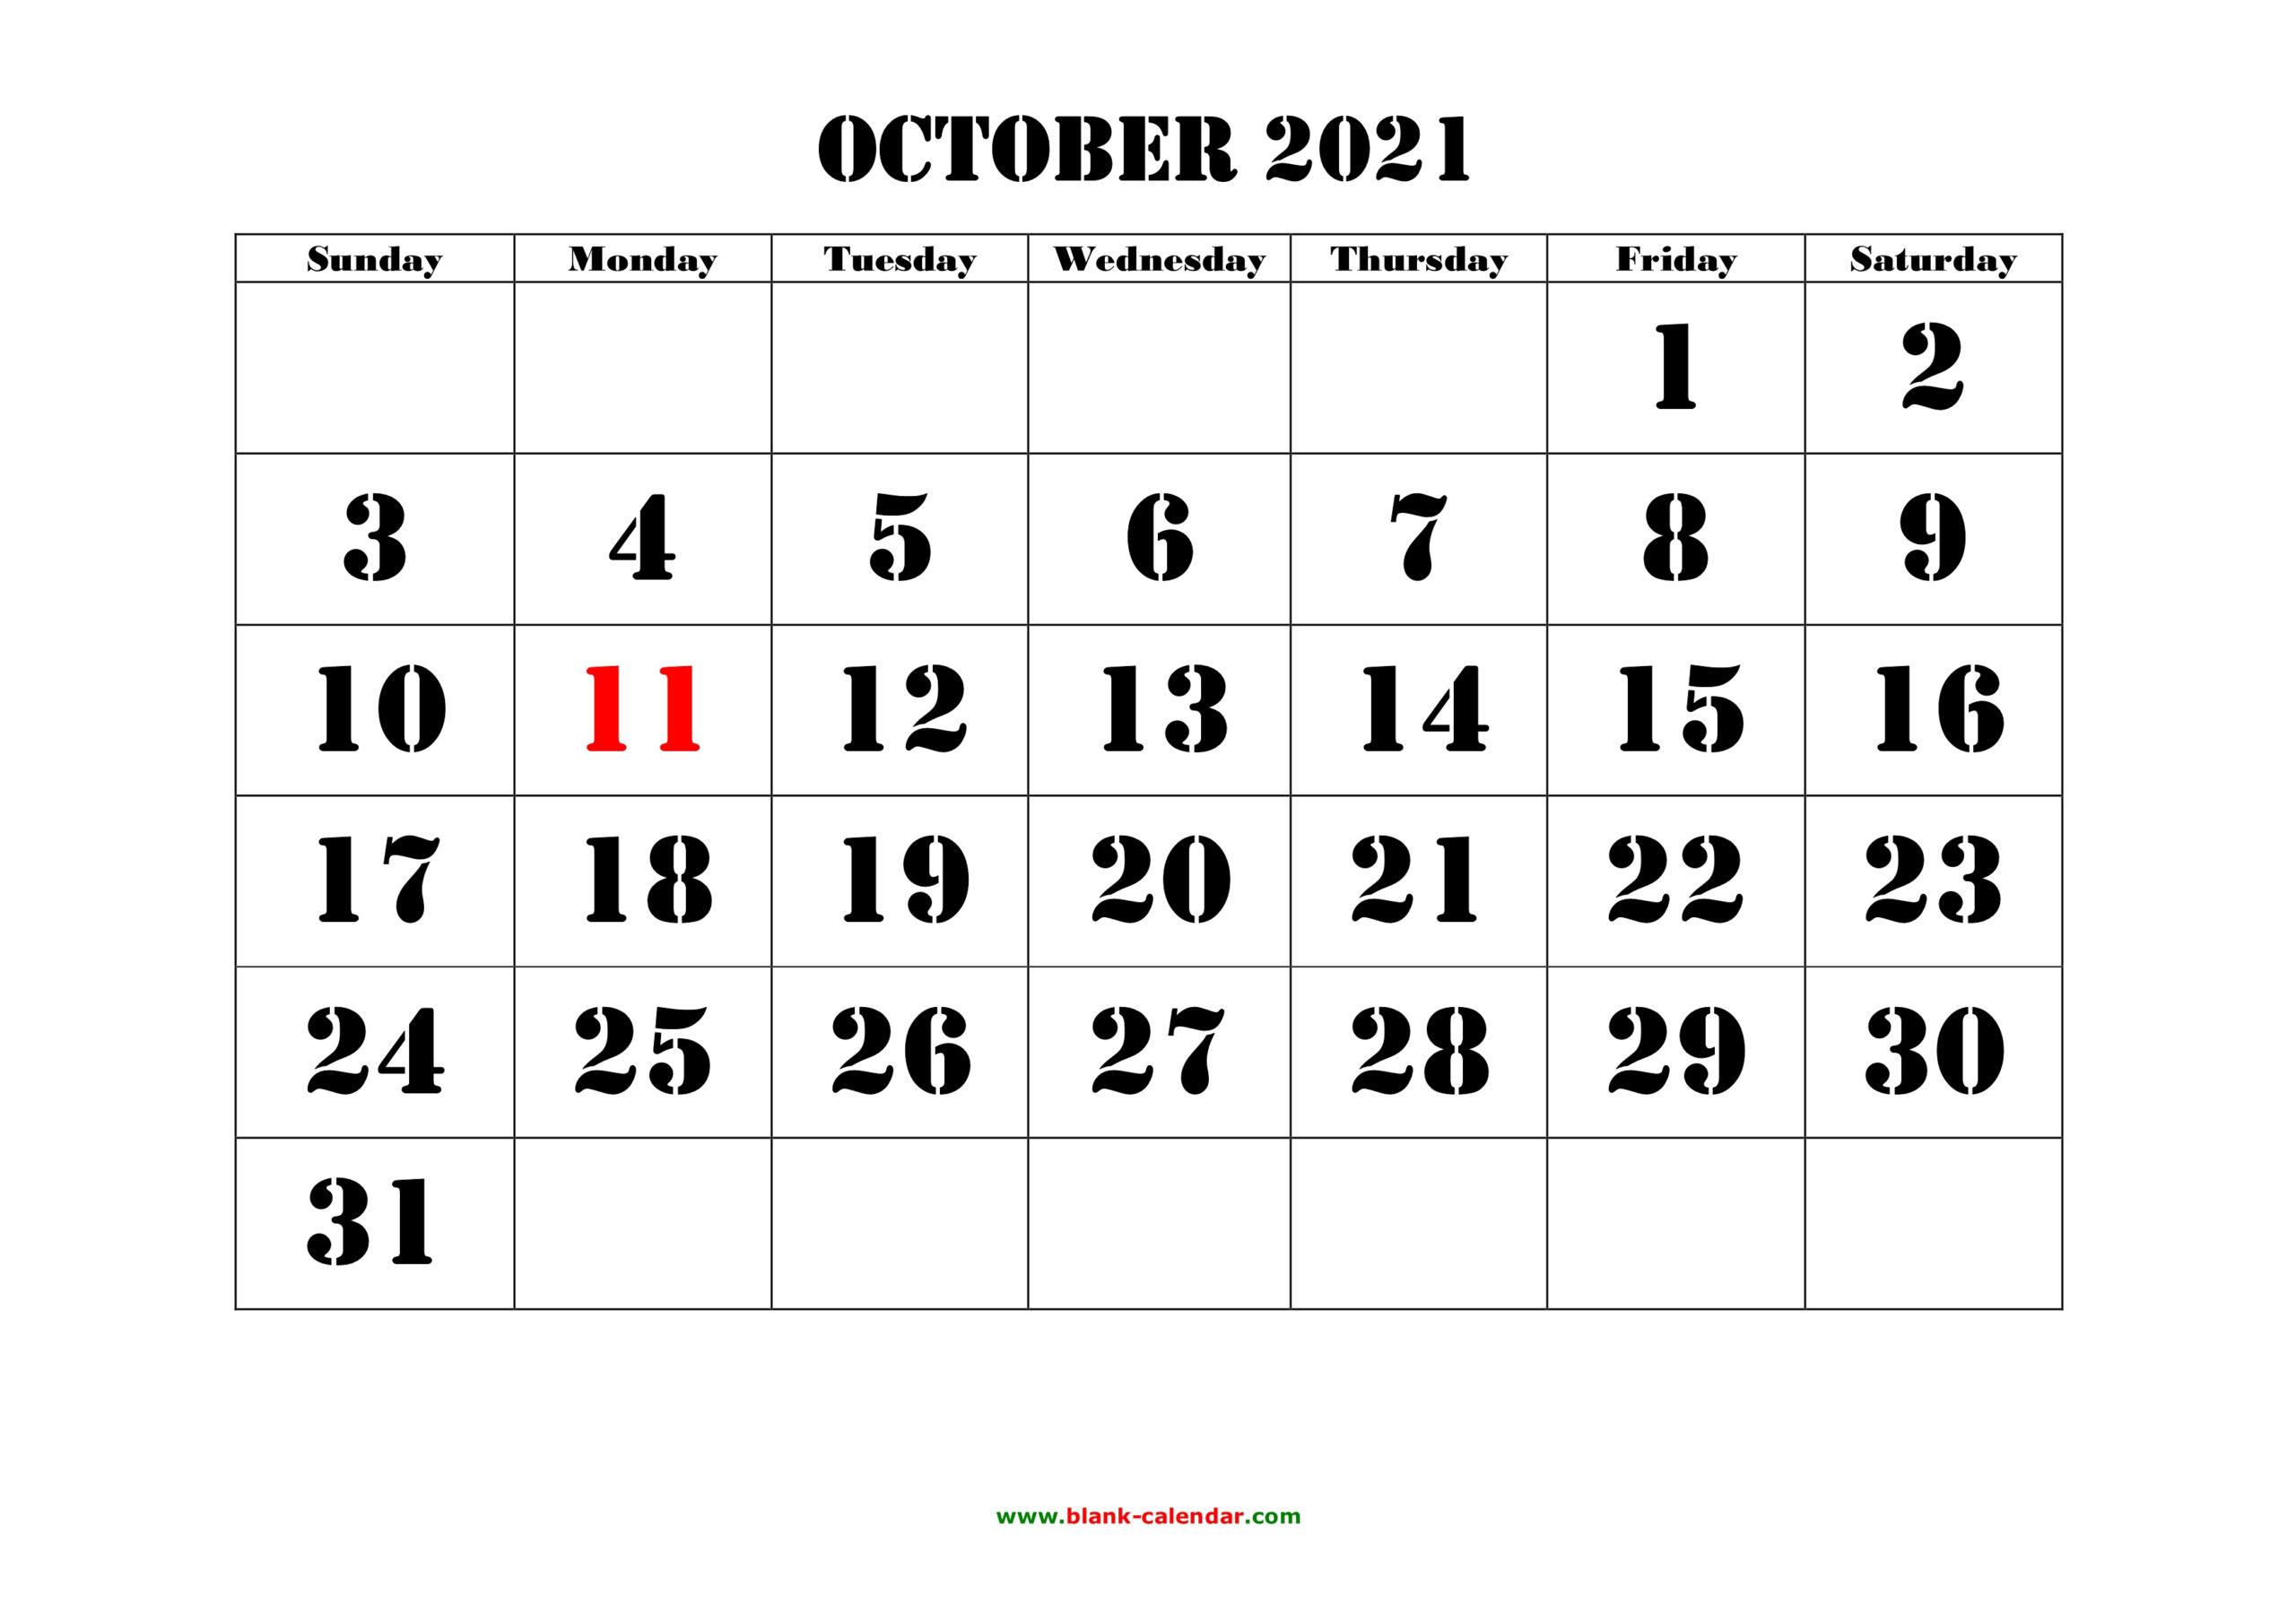 Free Download Printable October 2021 Calendar, Large Font pertaining to 2021 Large Bold Printable Calendar